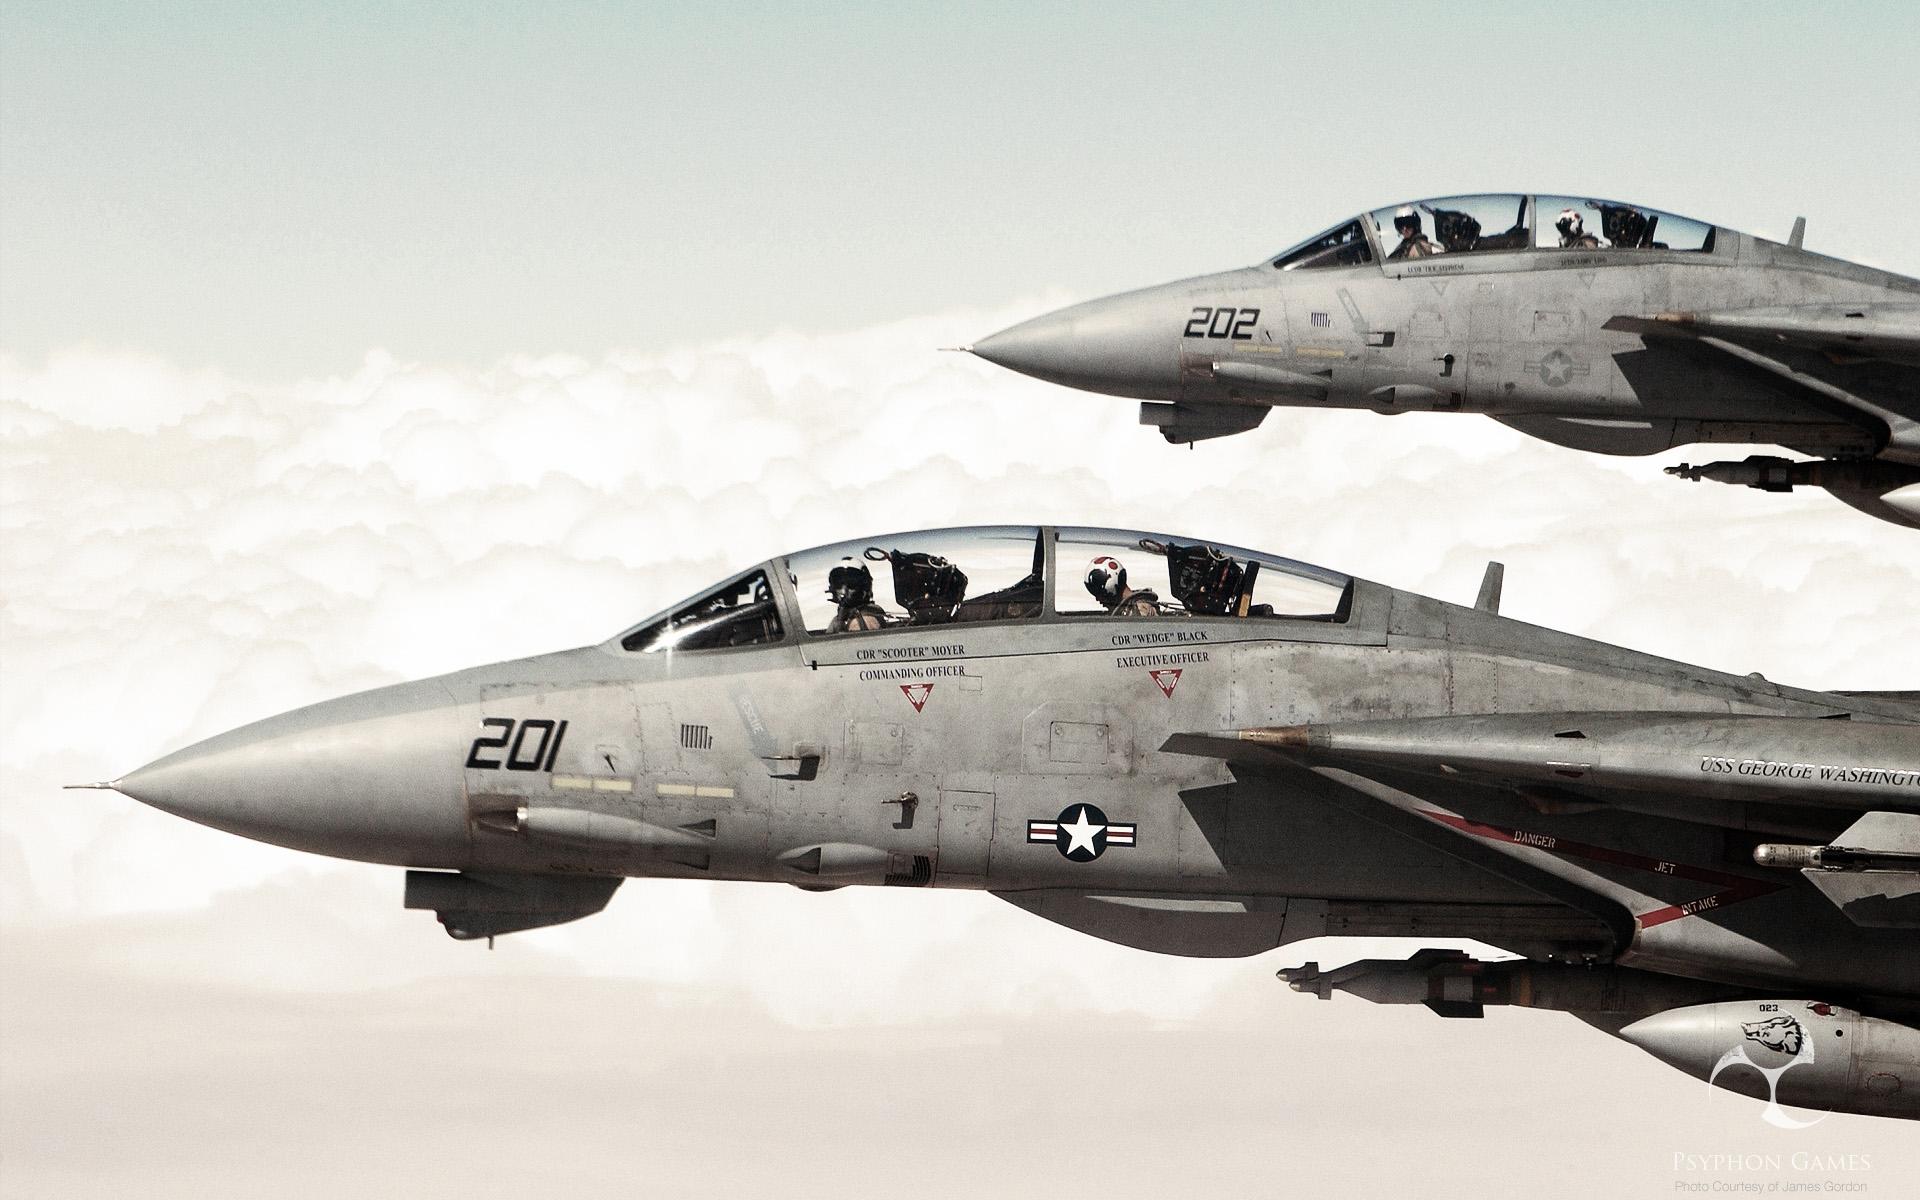 Grumman F-14 Tomcat Full HD Wallpaper And Background Image